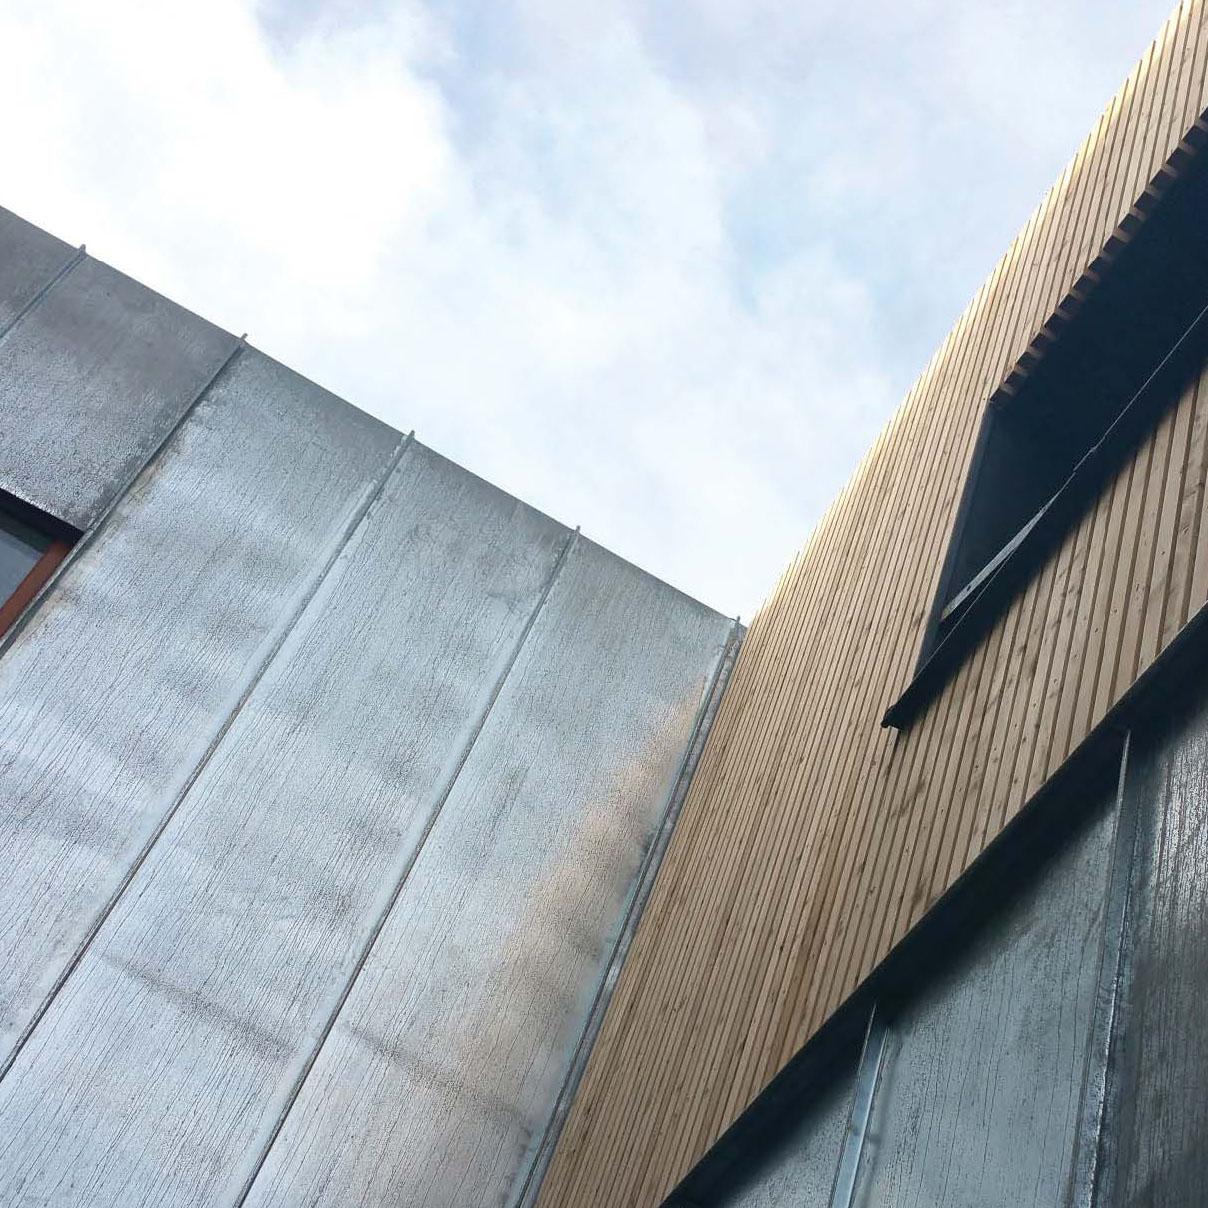 maskarade-architecture-surelevation-maison-individuelle-bois-zinc-facade